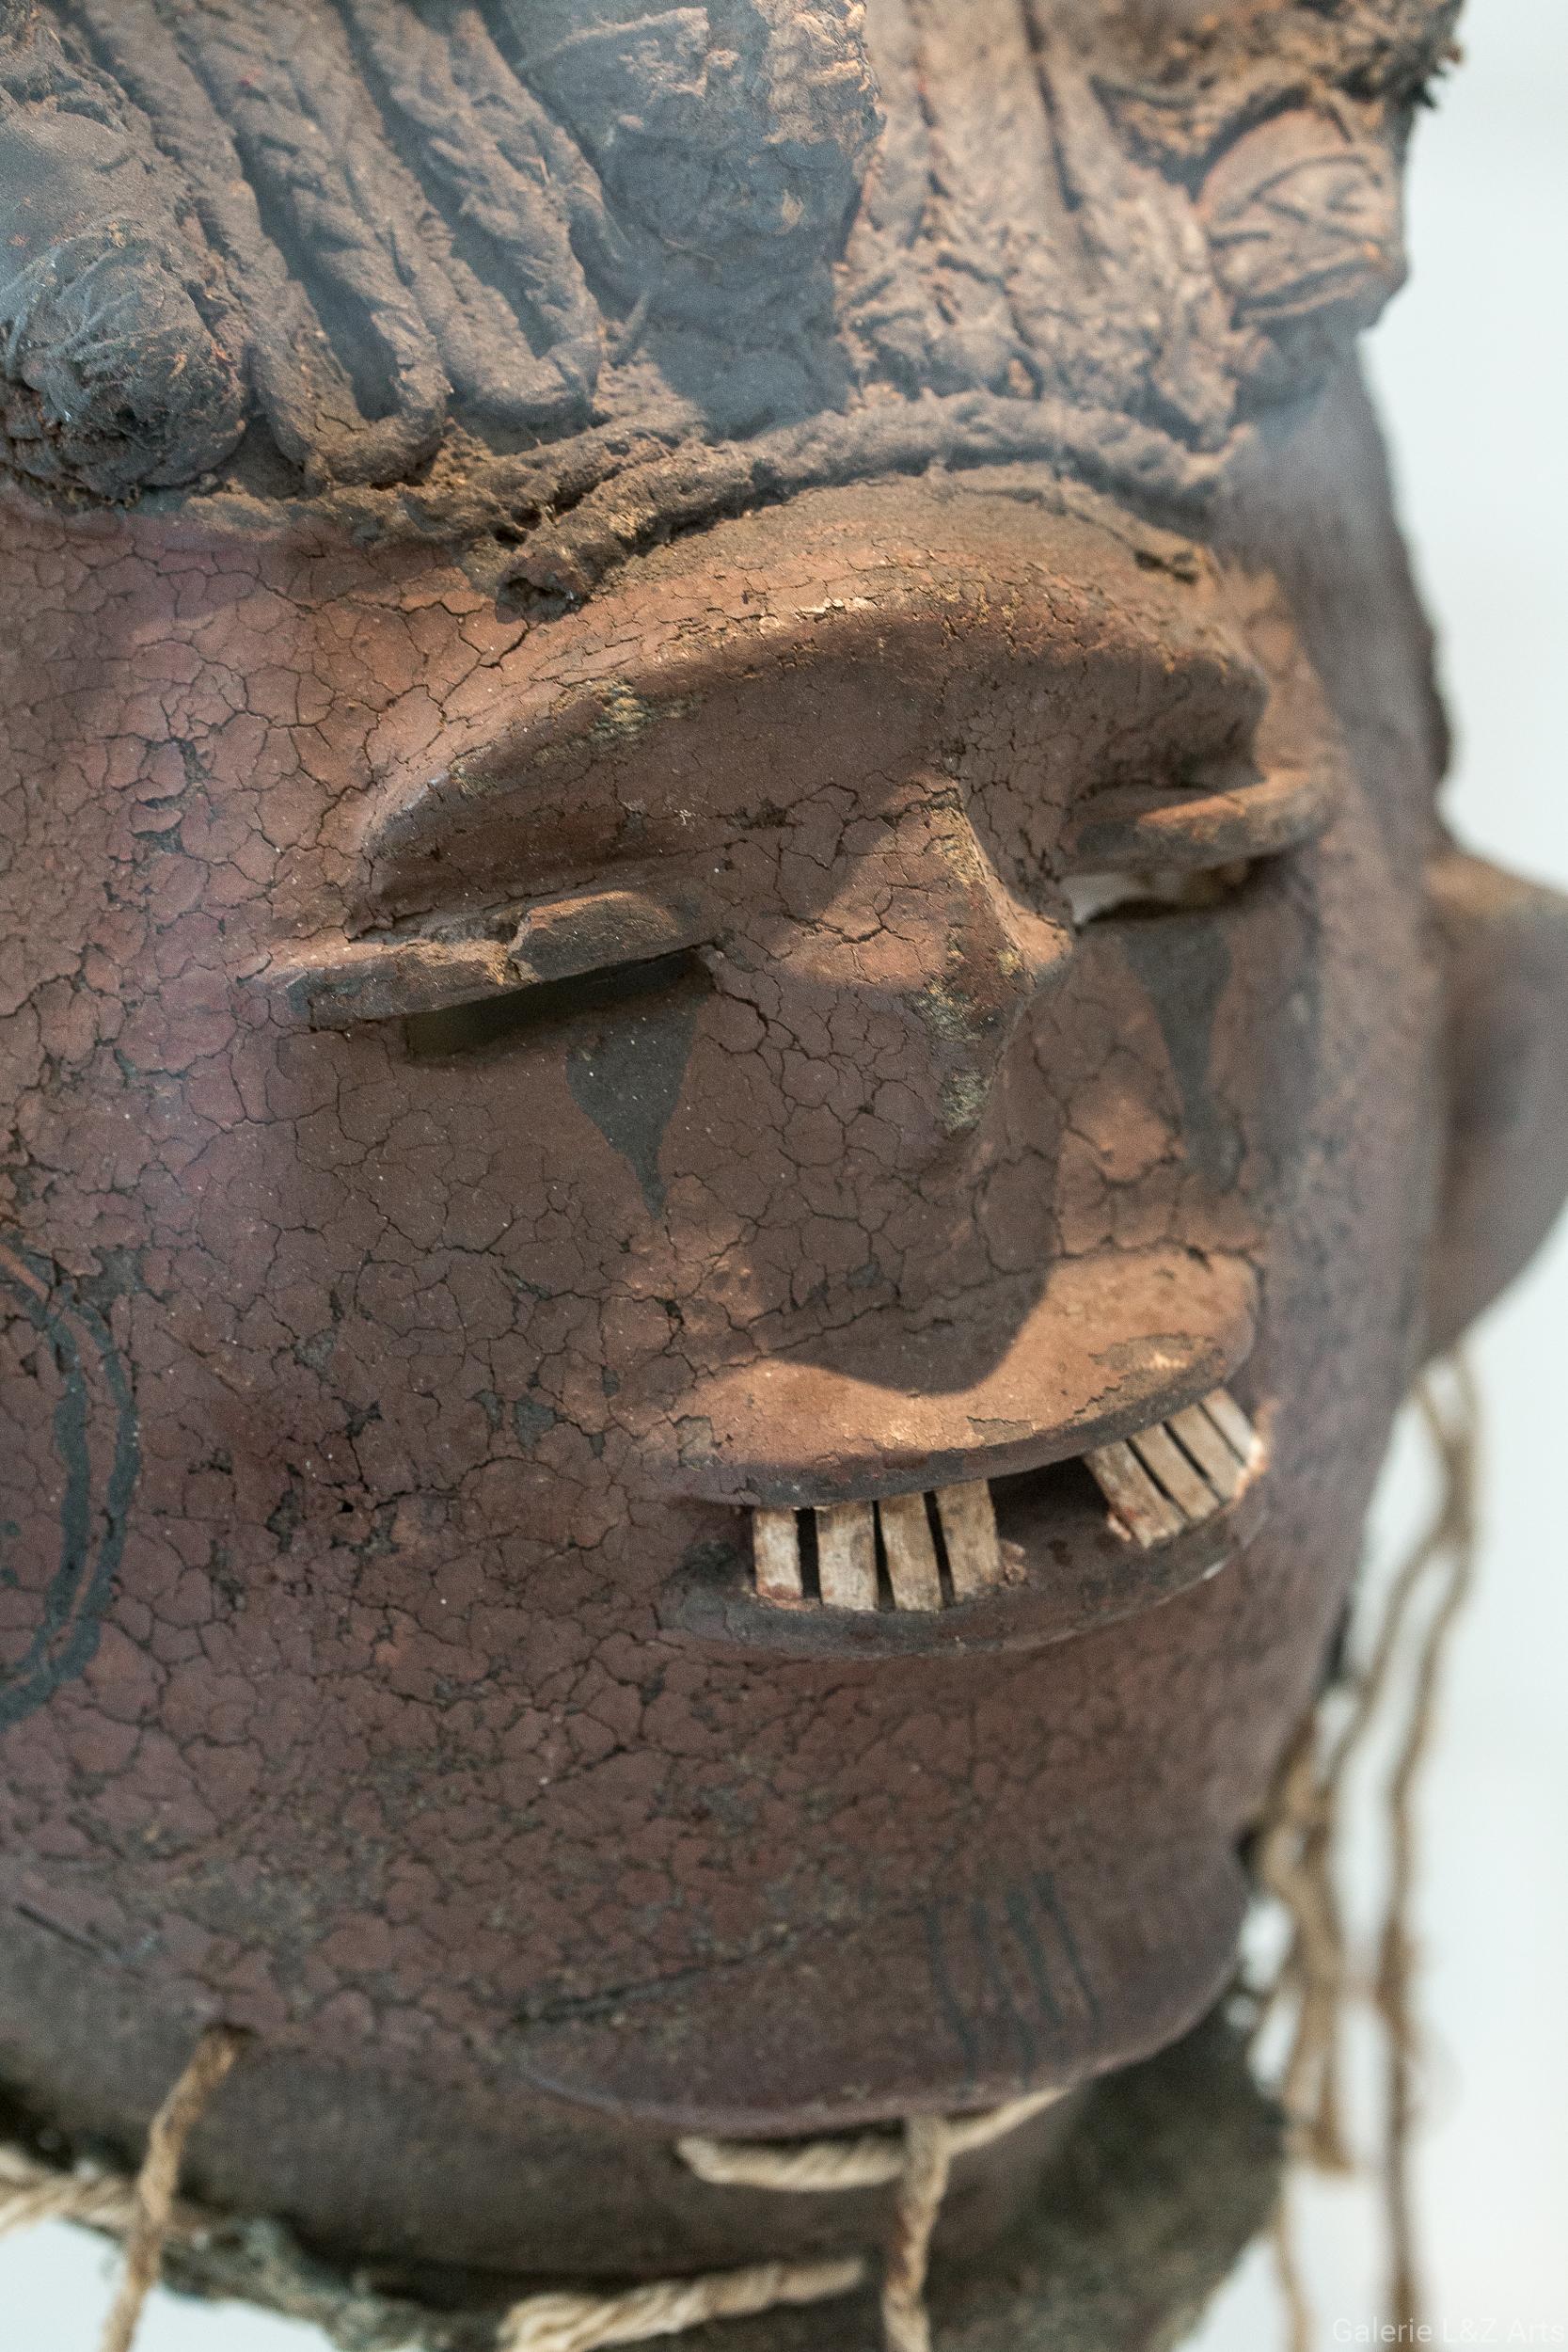 tribal-art-oostende-ostende-exposition-galerie-lz-art-africain-belgique-5.jpg